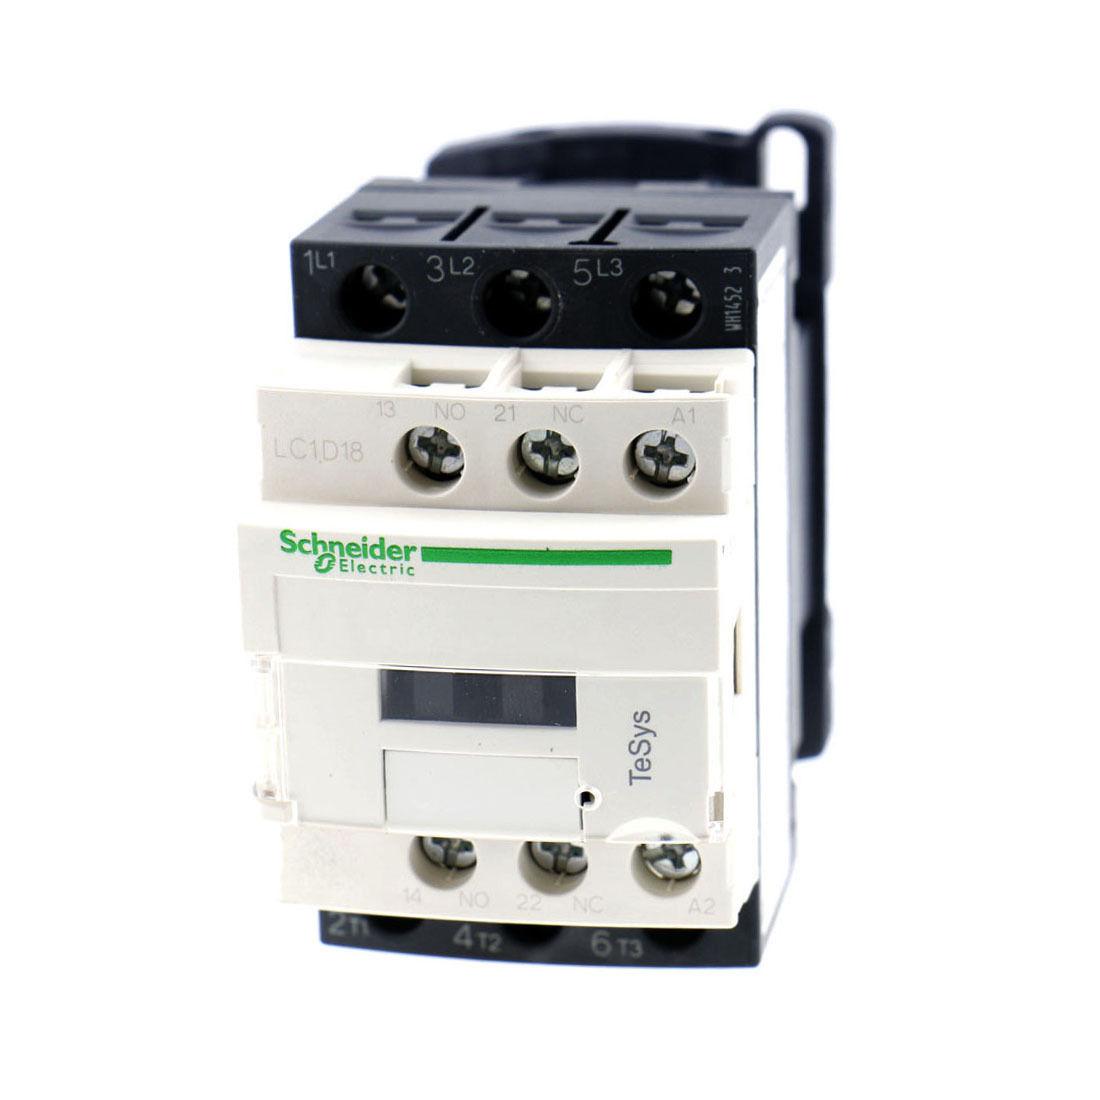 LC1D18 Motor Control AC Contactor 50 Amp 3 Phase 110-120V 50/60Hz Coil  замыкатель ux motor lc1d09 ac 110 50 60 3 nc